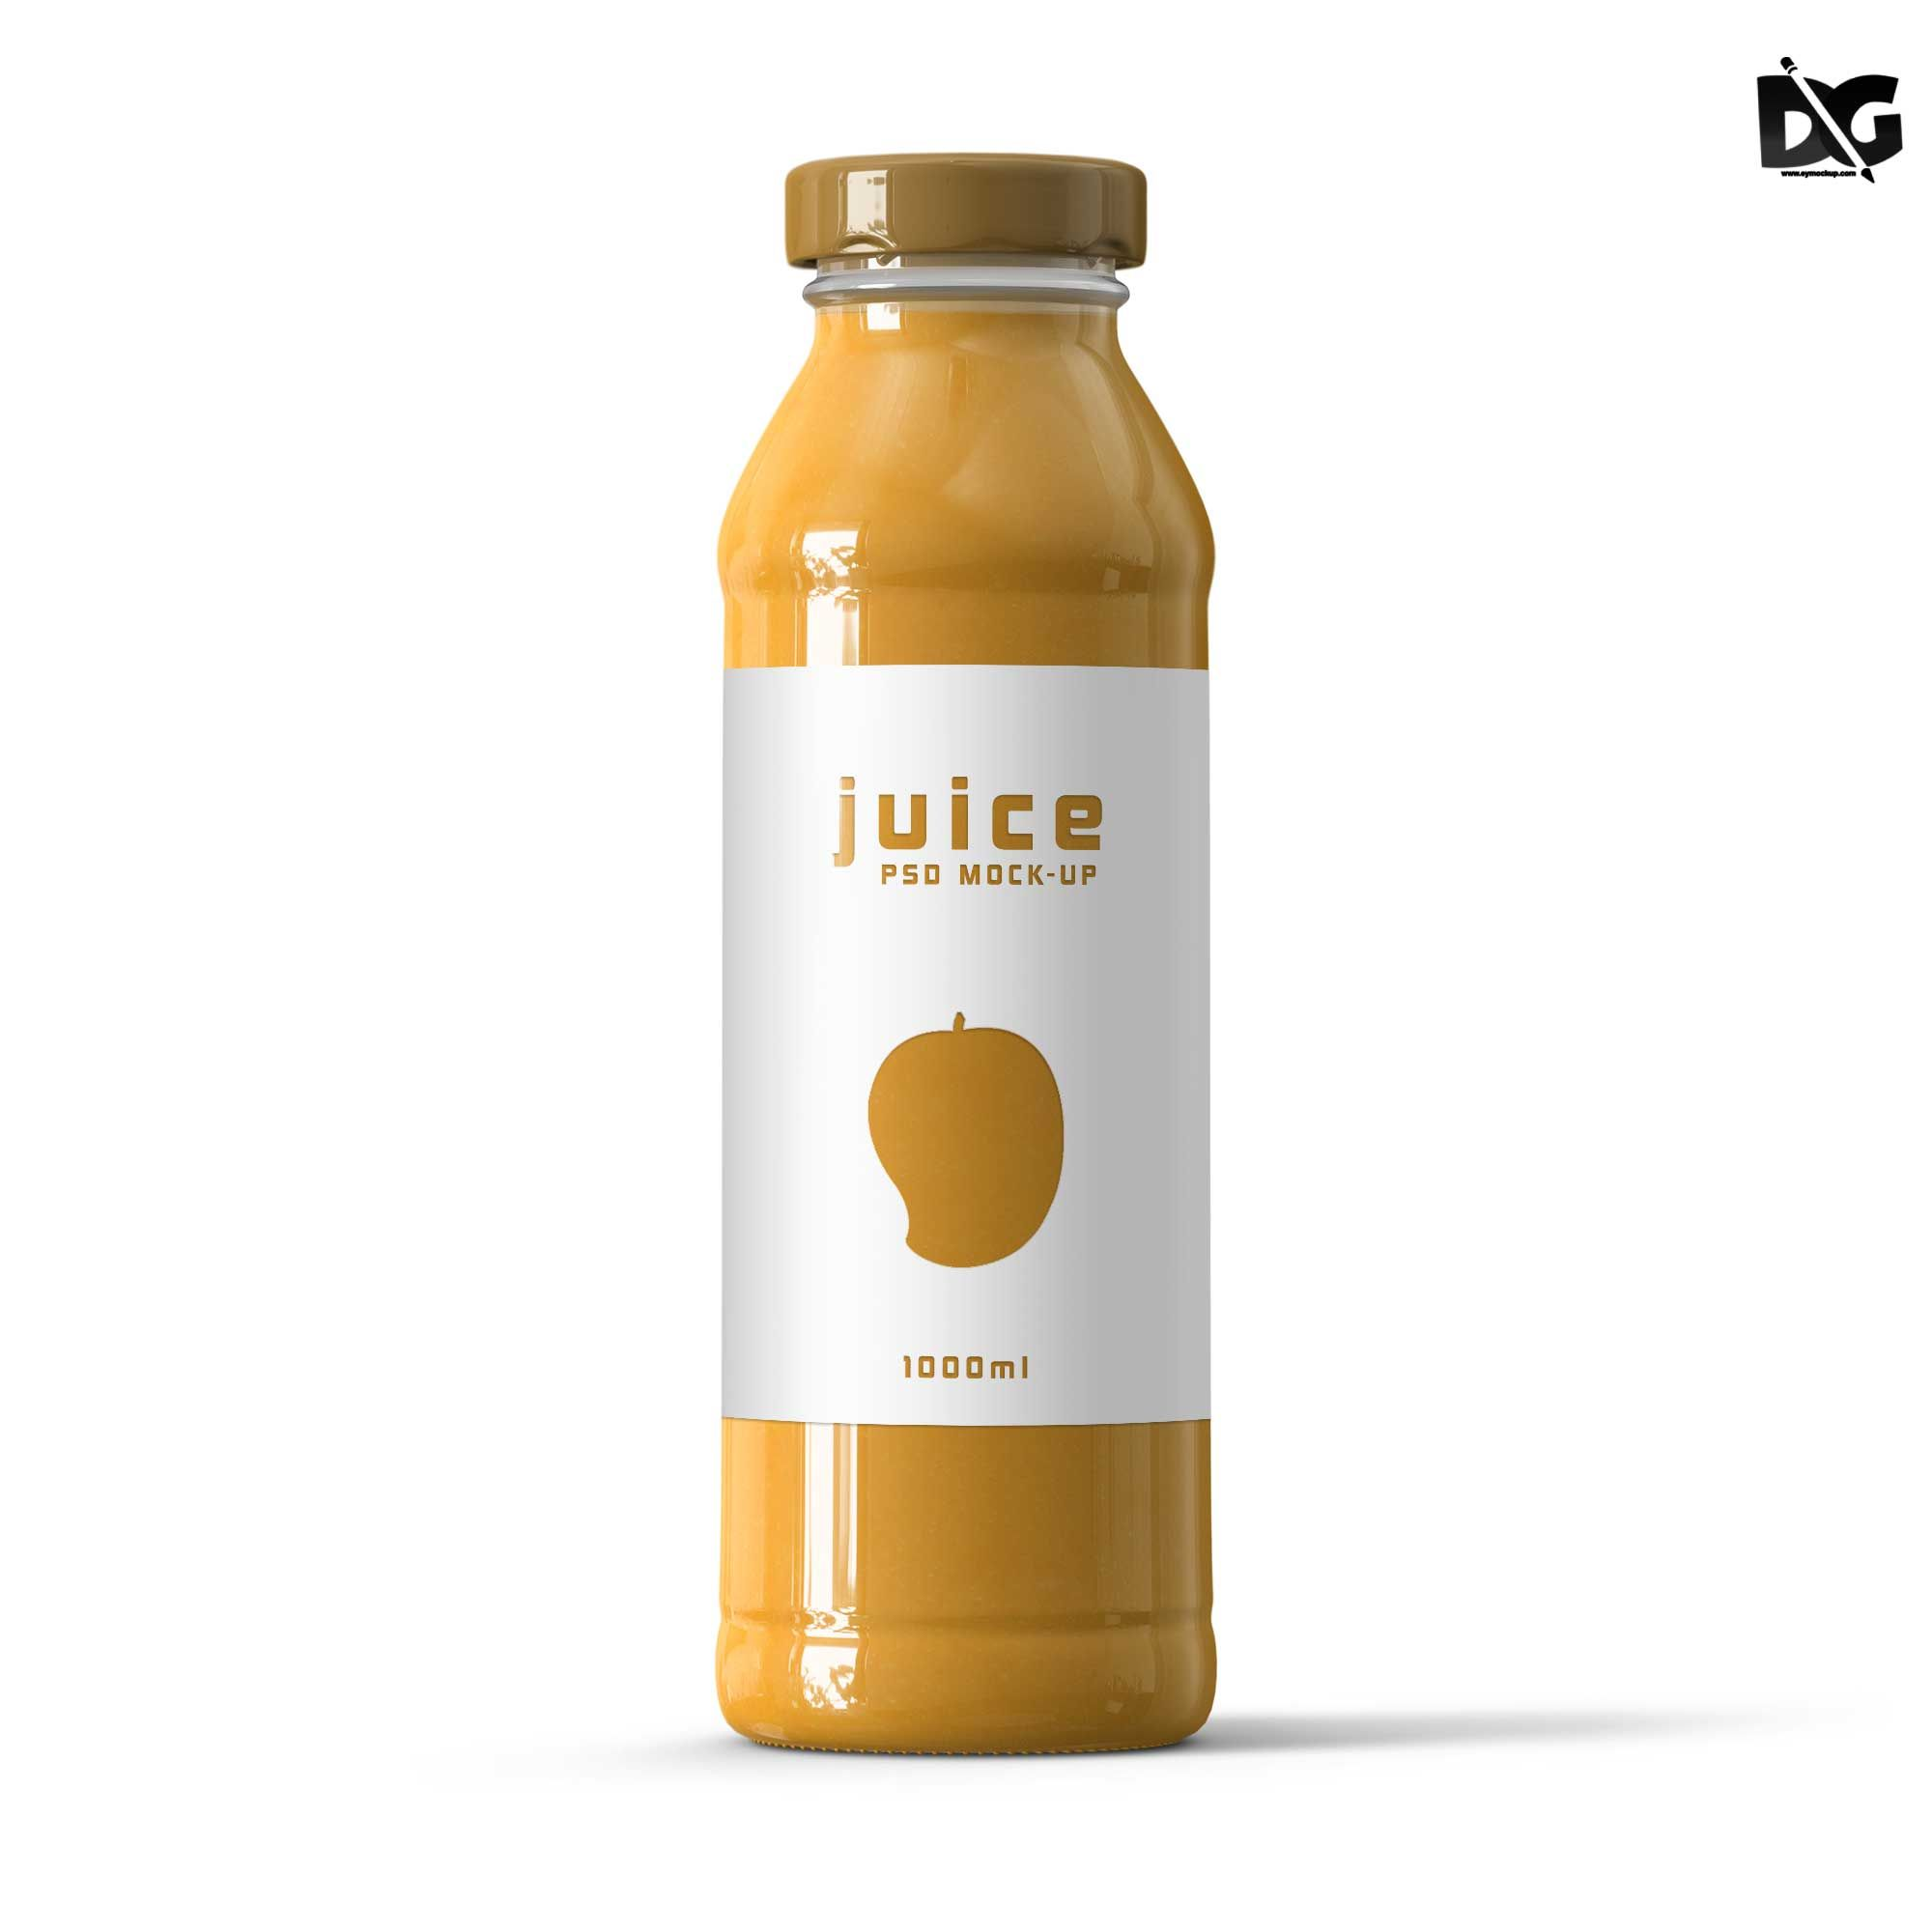 Free Mango Juice Plastic Bottle Label Psd Mockup Label Labelmockup Labelpsd Mockup Psd Psd2018 Psdmockup Plastic Bottles Labels Mockup Free Psd Bottle